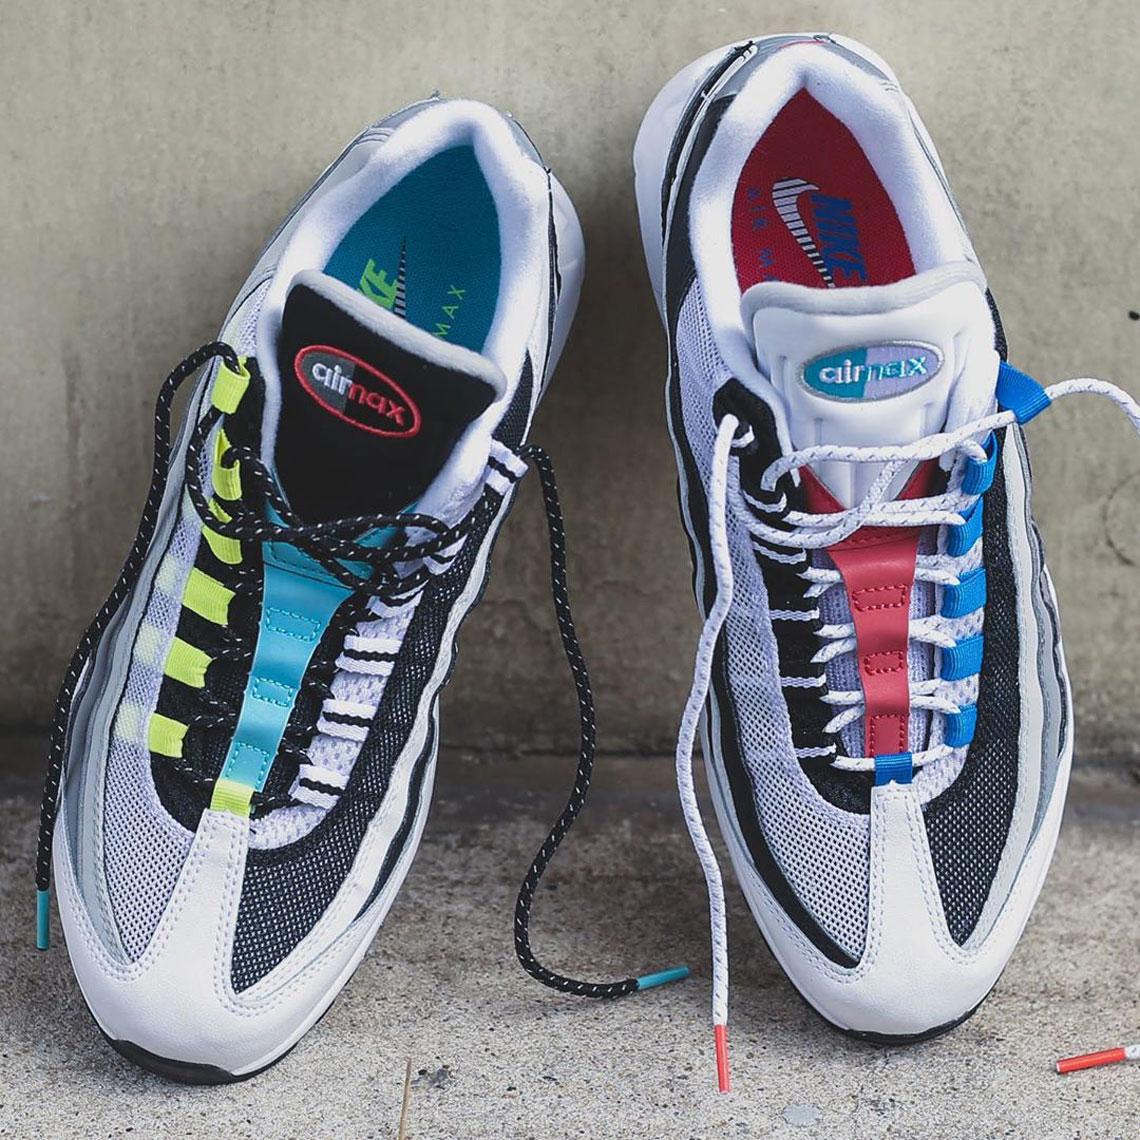 Nike Air Max 95 Greedy 2020 CJ0589 001 Crumpe